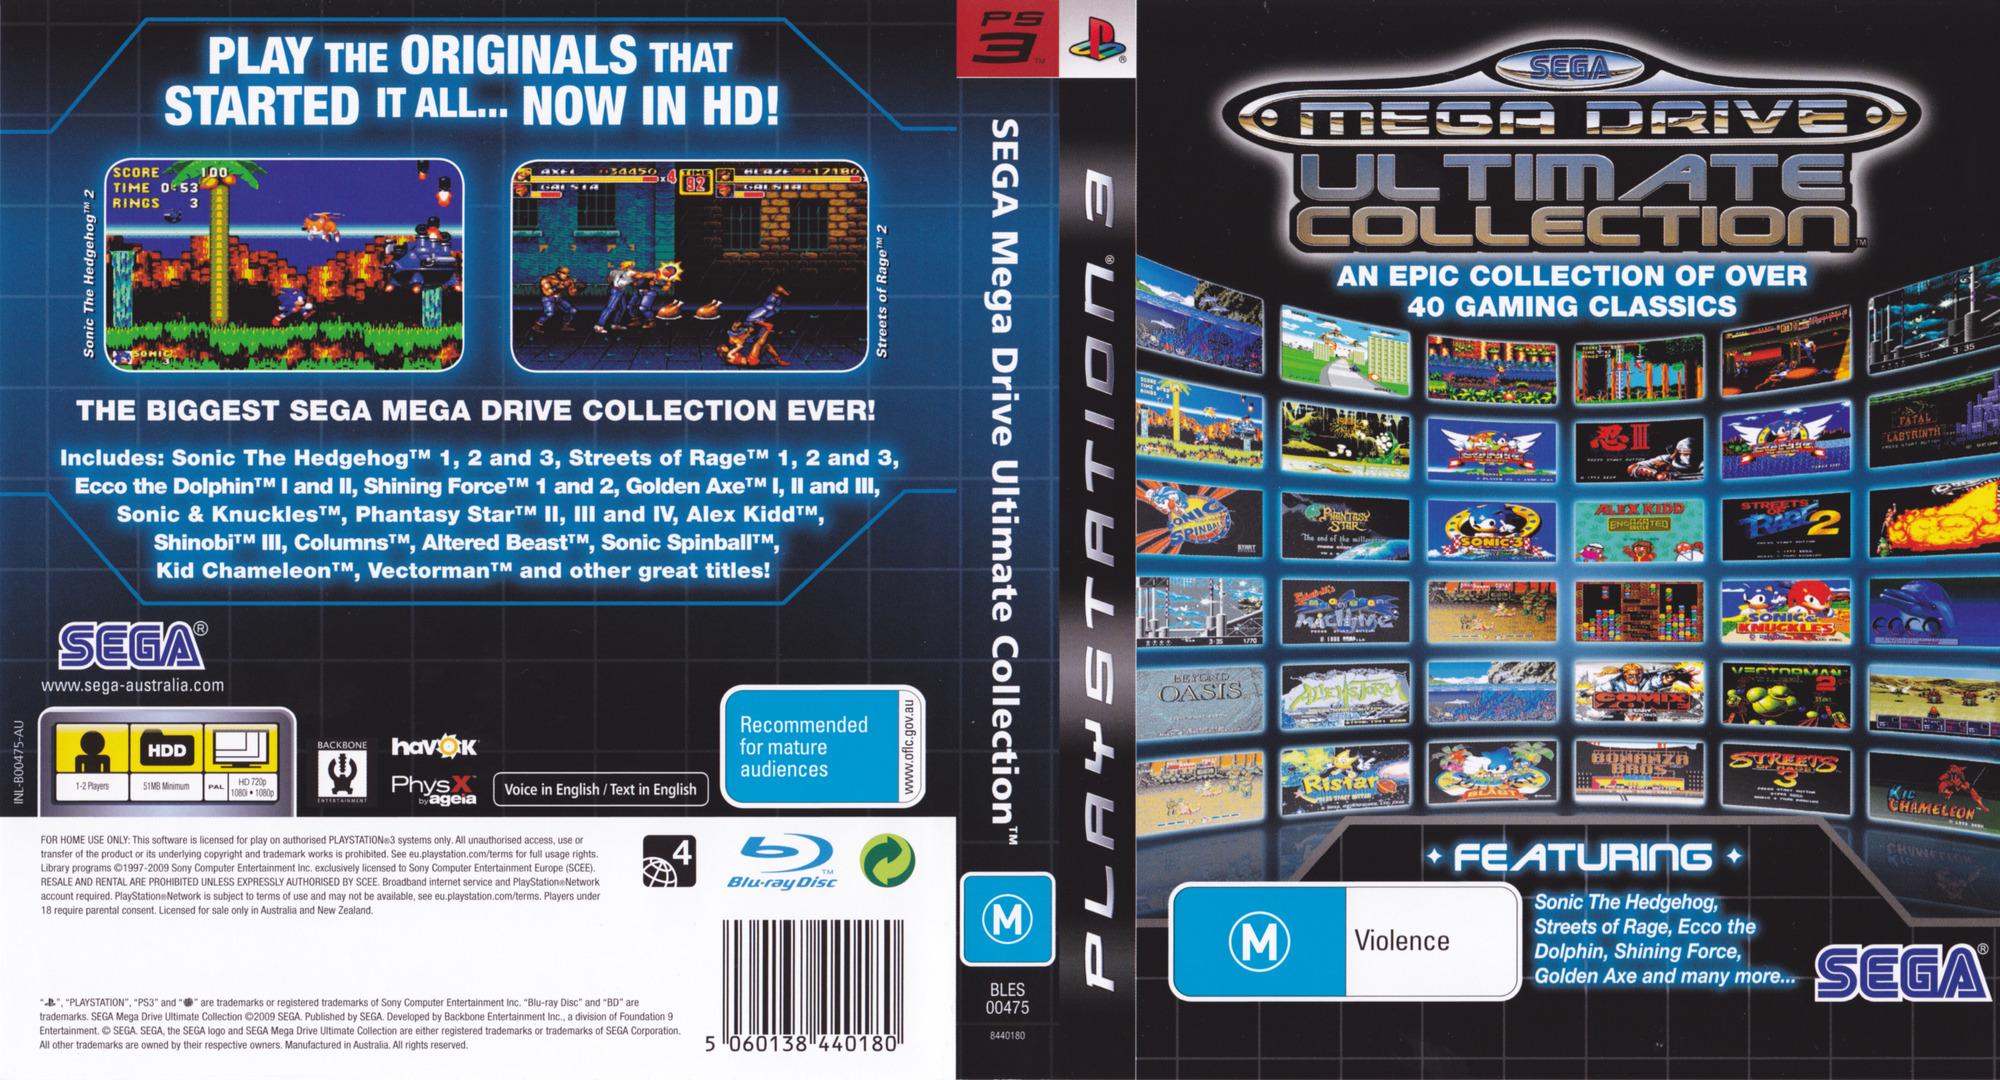 Bles00475 Sega Mega Drive Ultimate Collection